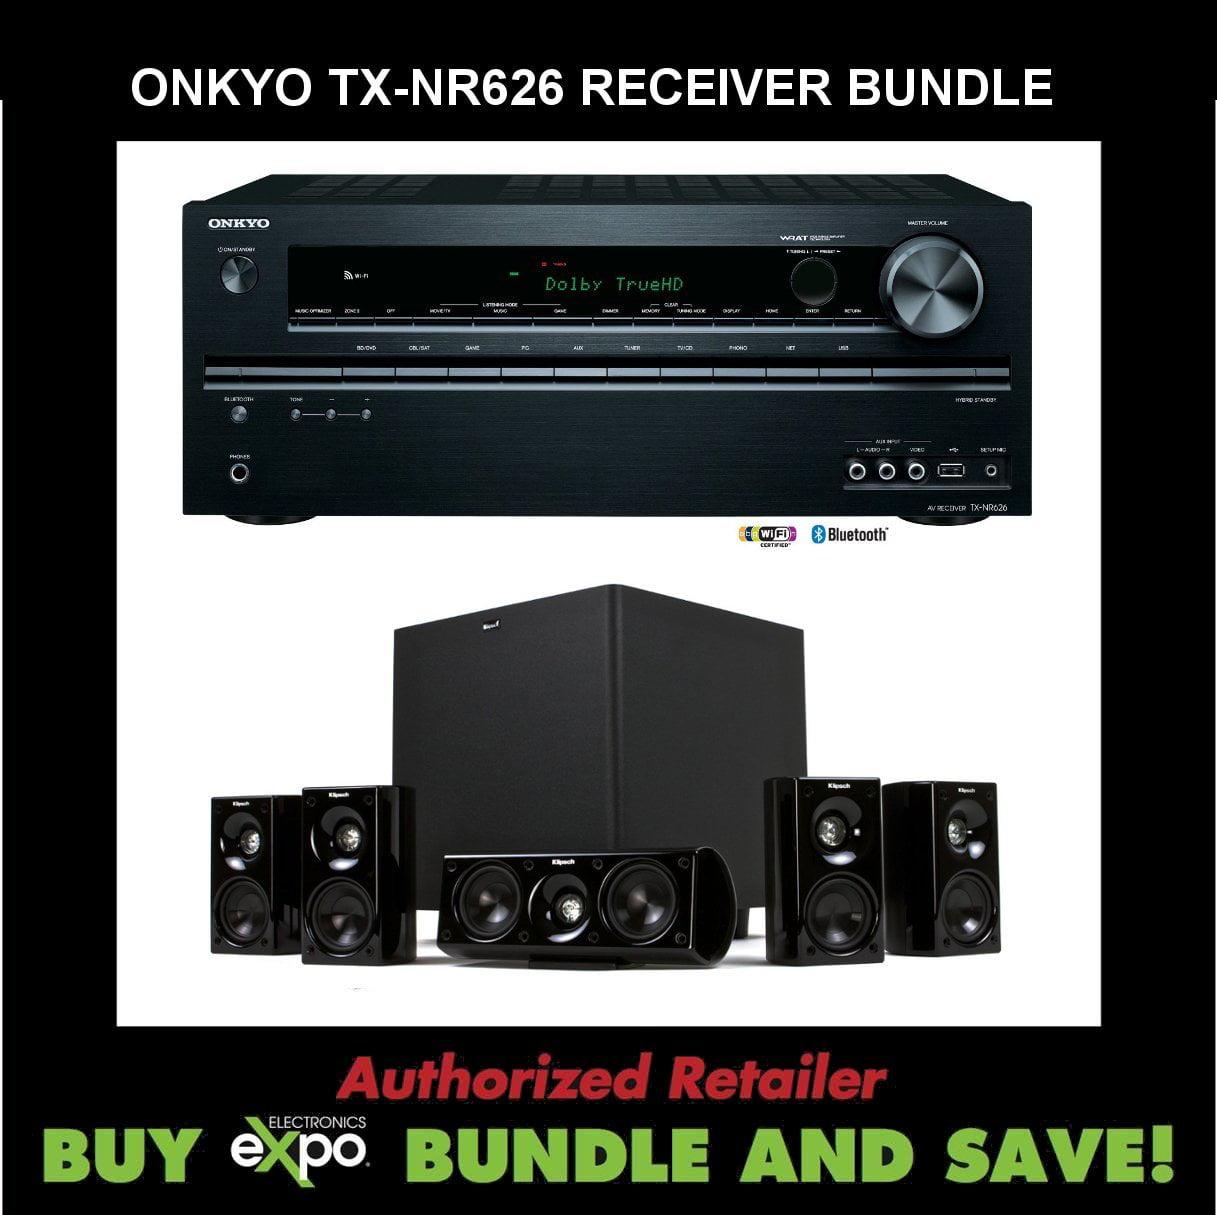 Onkyo TX-NR626 5.2-Channel Network Audio Video Receiver, Plus Klipsch HDT-600 Home Theater Speaker System by Onkyo